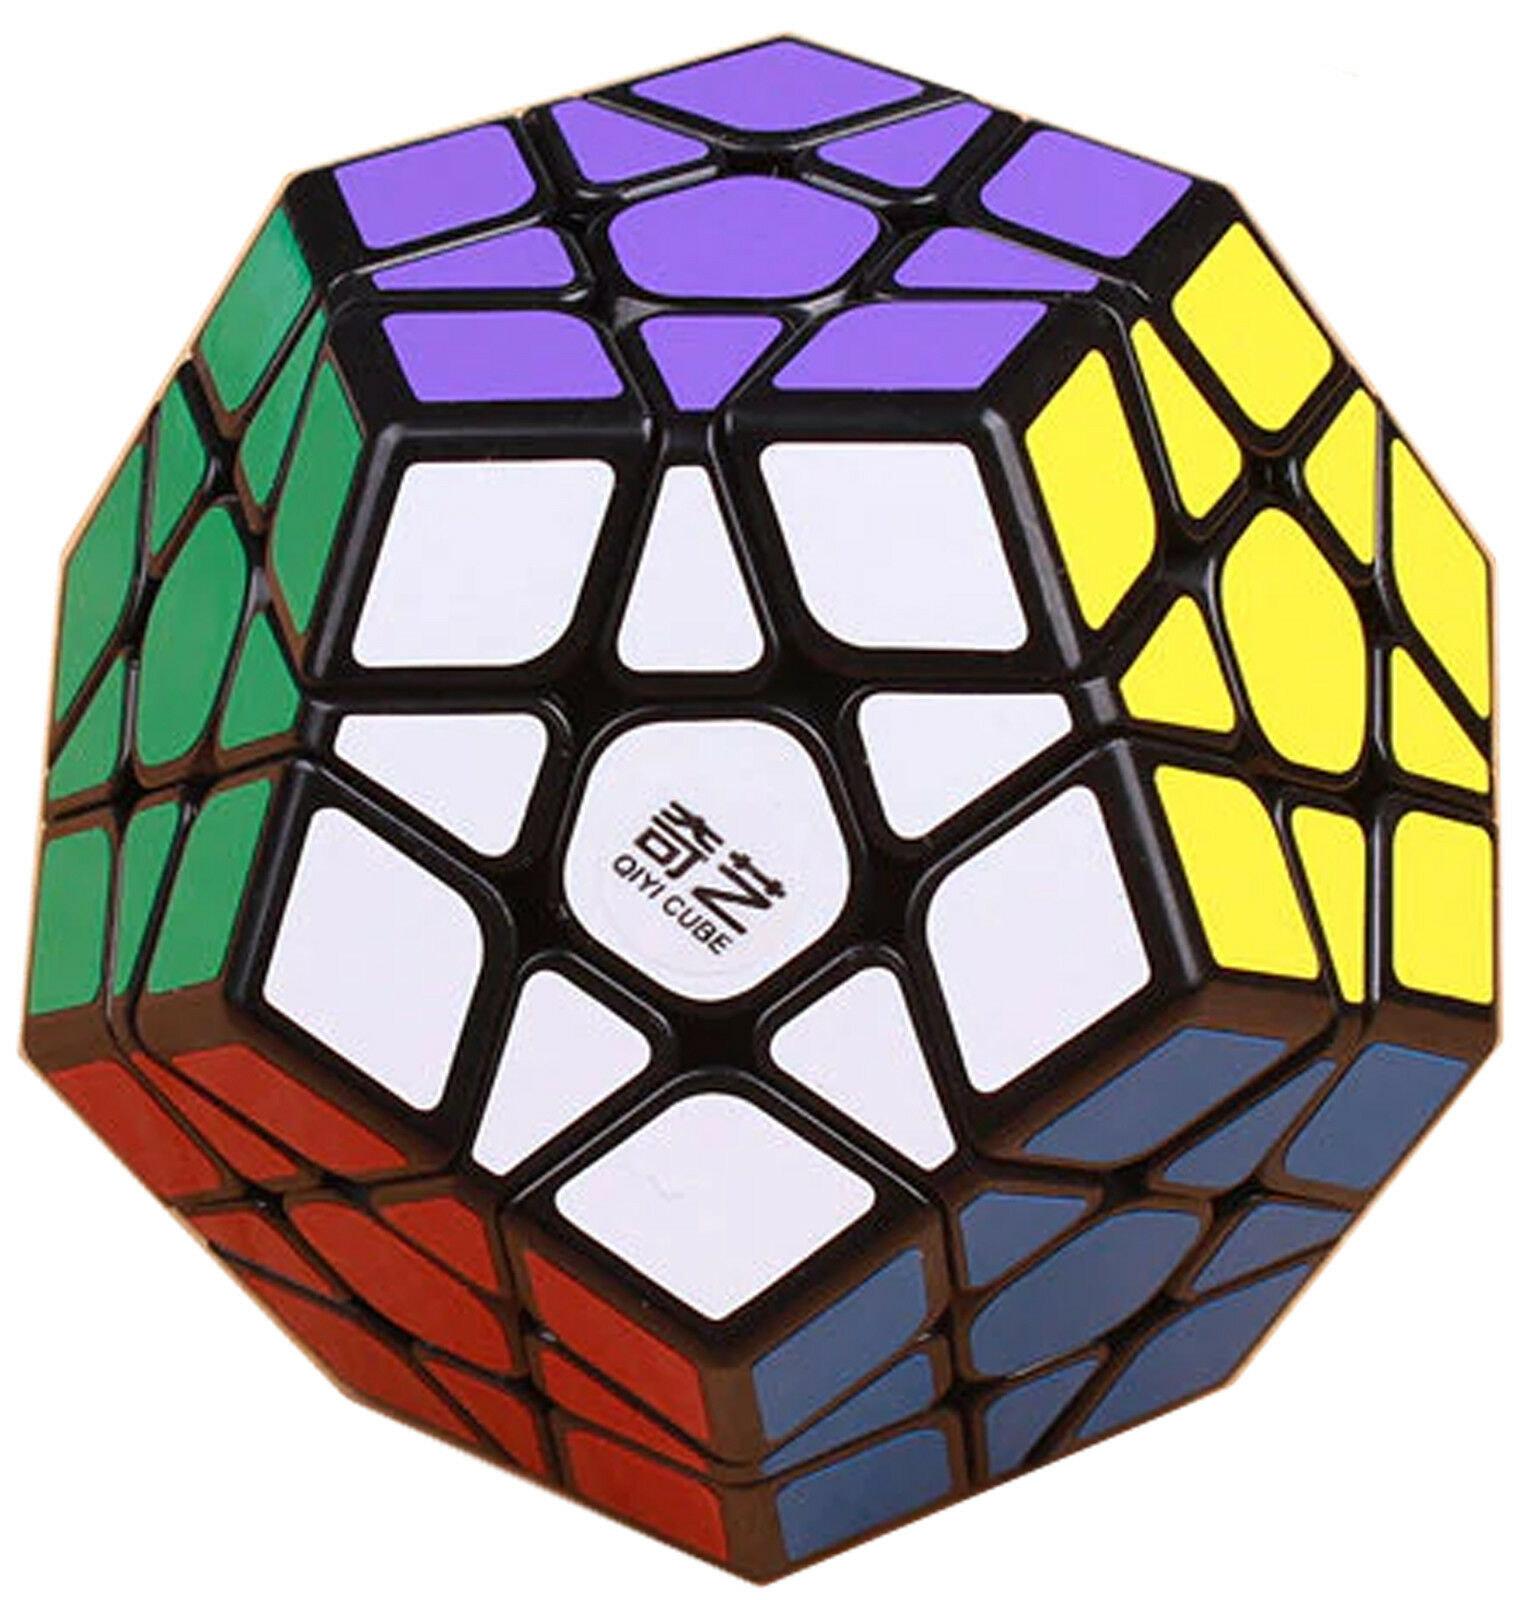 12 Sided QiYi Megaminx QiHeng Speed Cube Magic Twist 3D Puzz